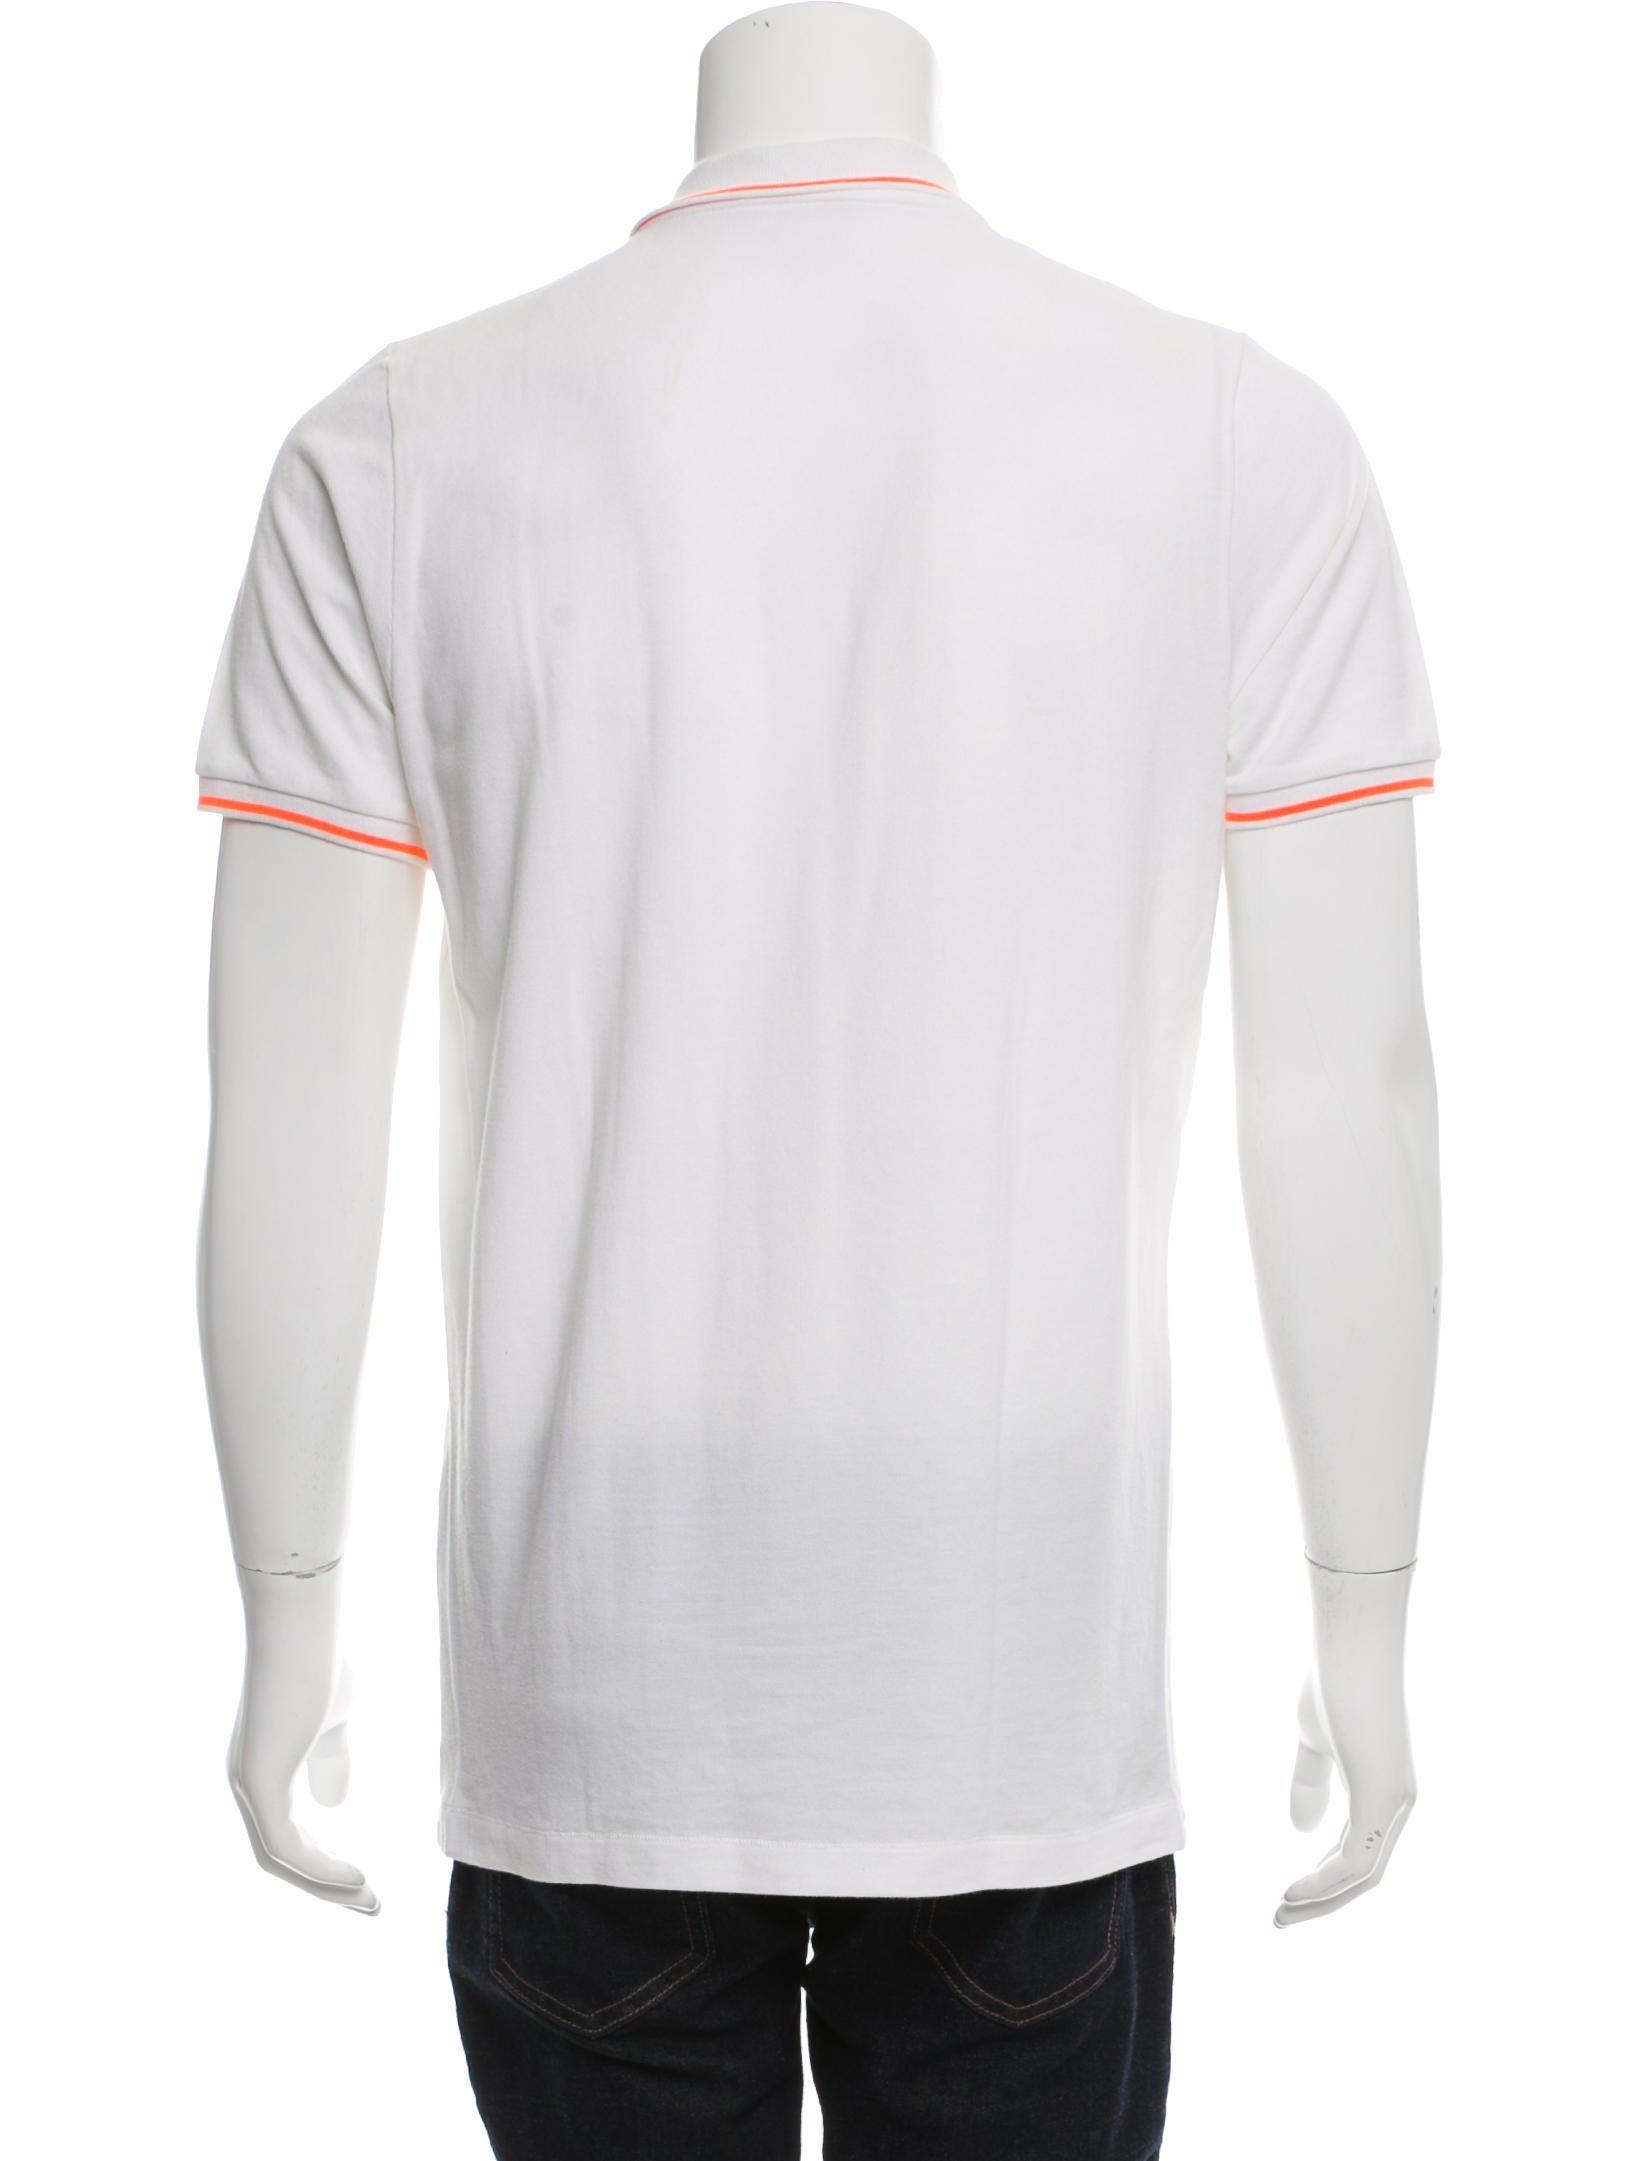 Tomas maier logo embroidered polo shirt clothing for Shirt with logo embroidered